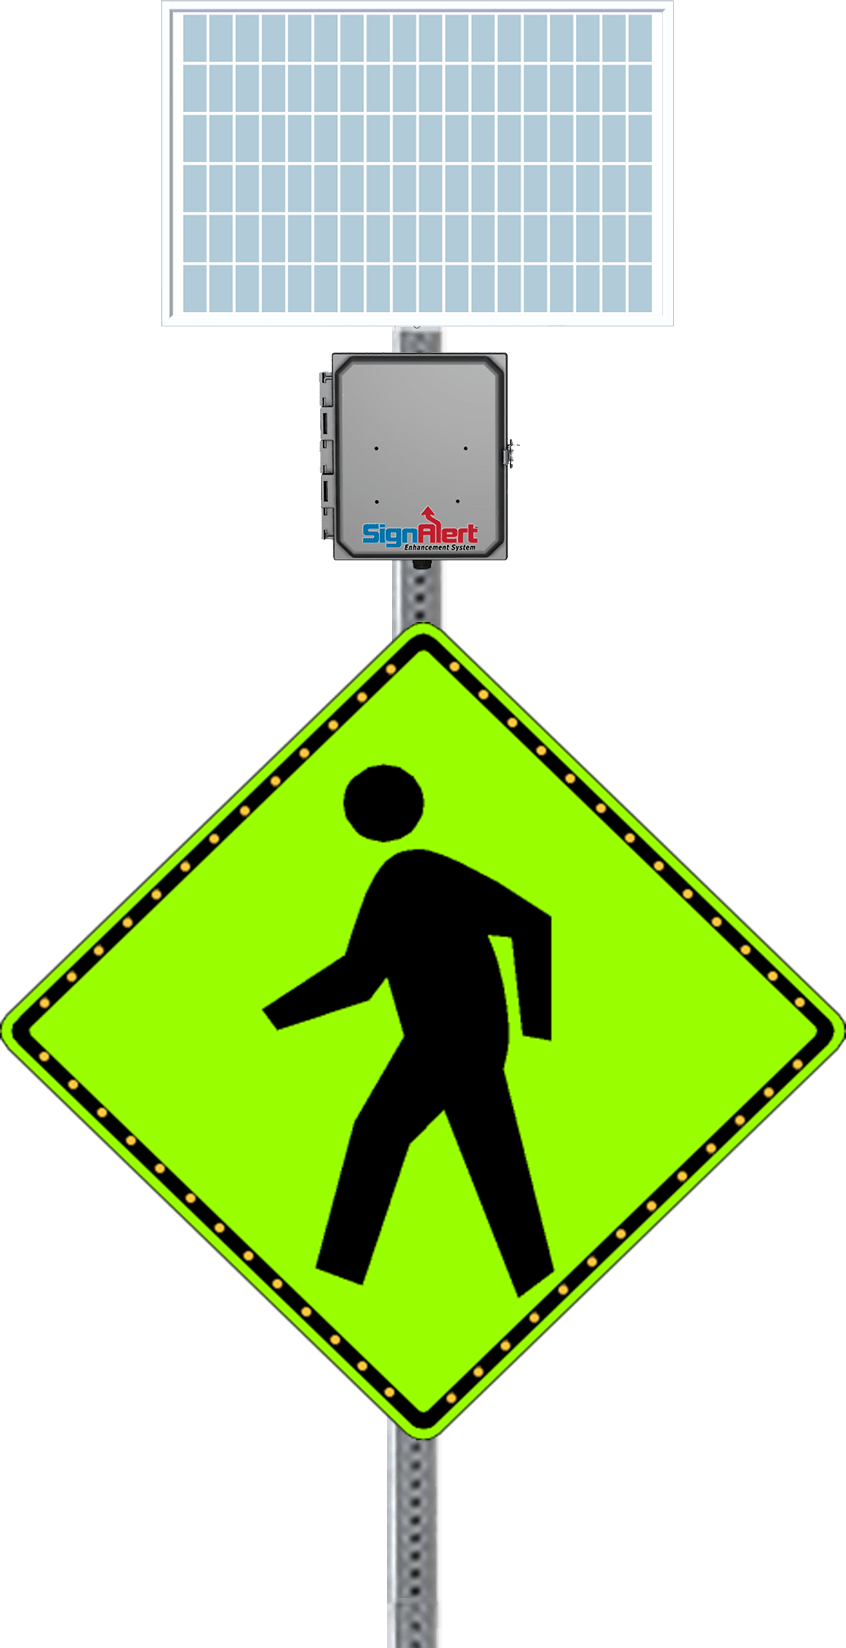 Ped Crossing - SA Advanced